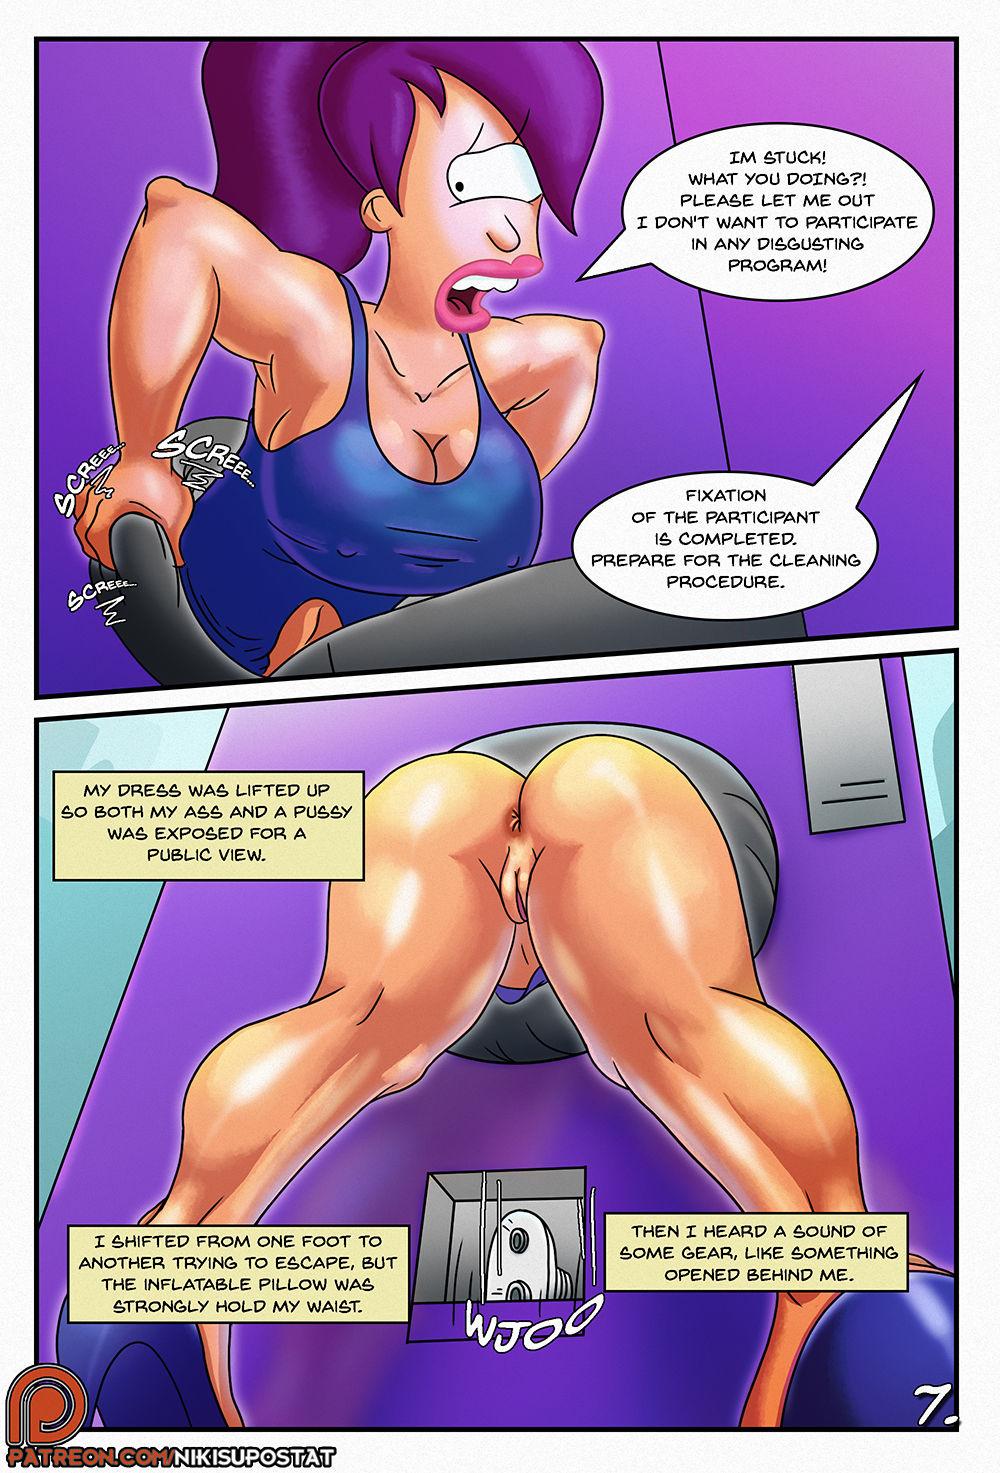 Futurama Hentai Tumblr pertaining to futurama- money hole - hentai comics